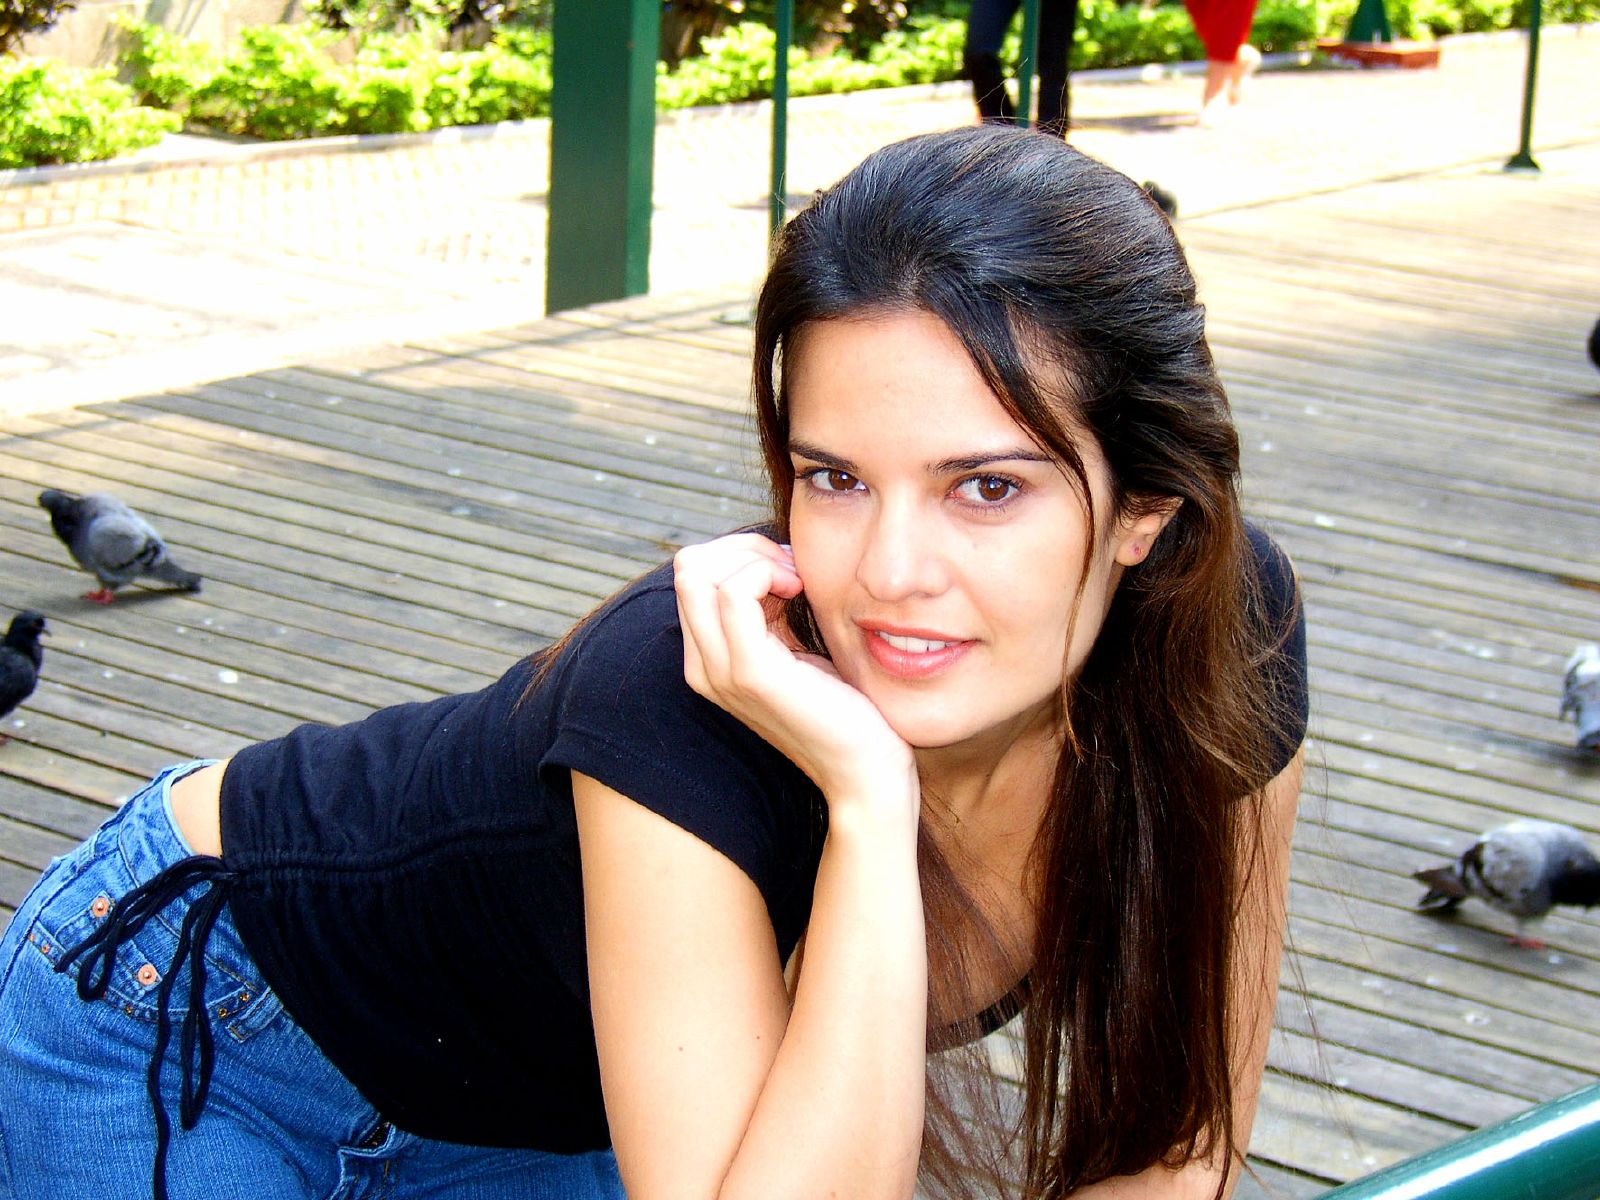 File Raquel Nunes 2 Jpg Wikimedia Commons